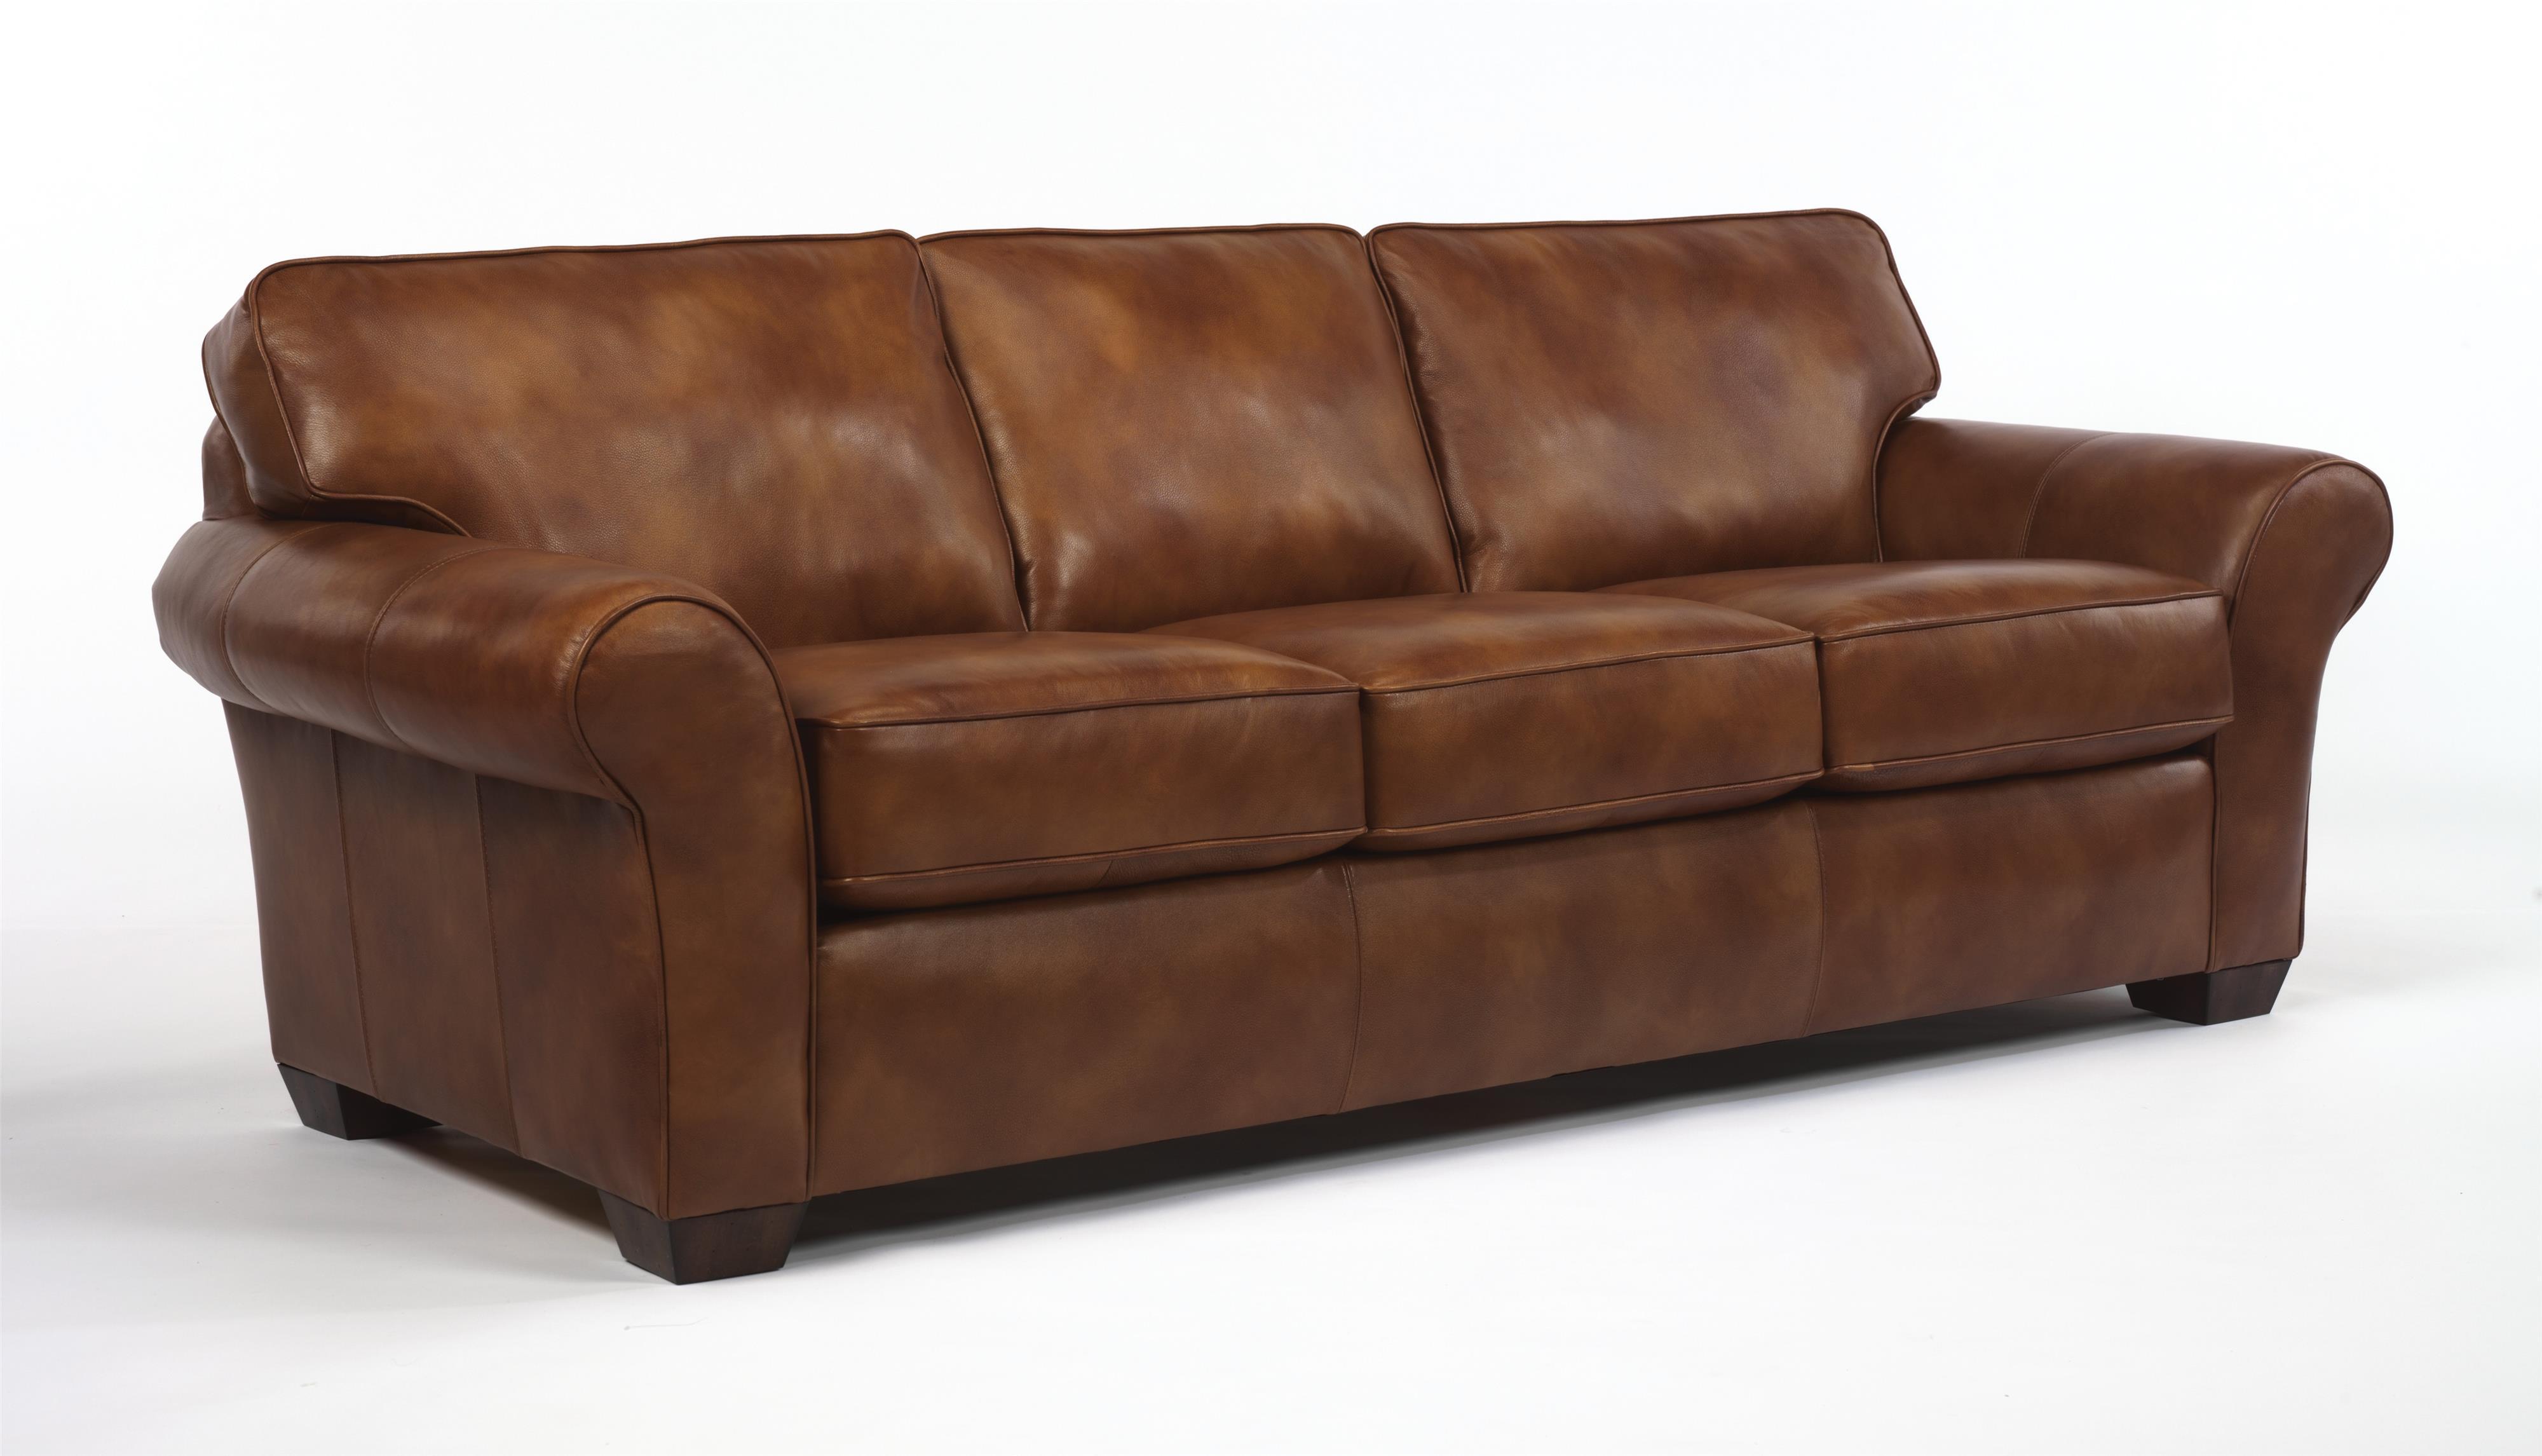 Flexsteel Sofa Cushion Replacement